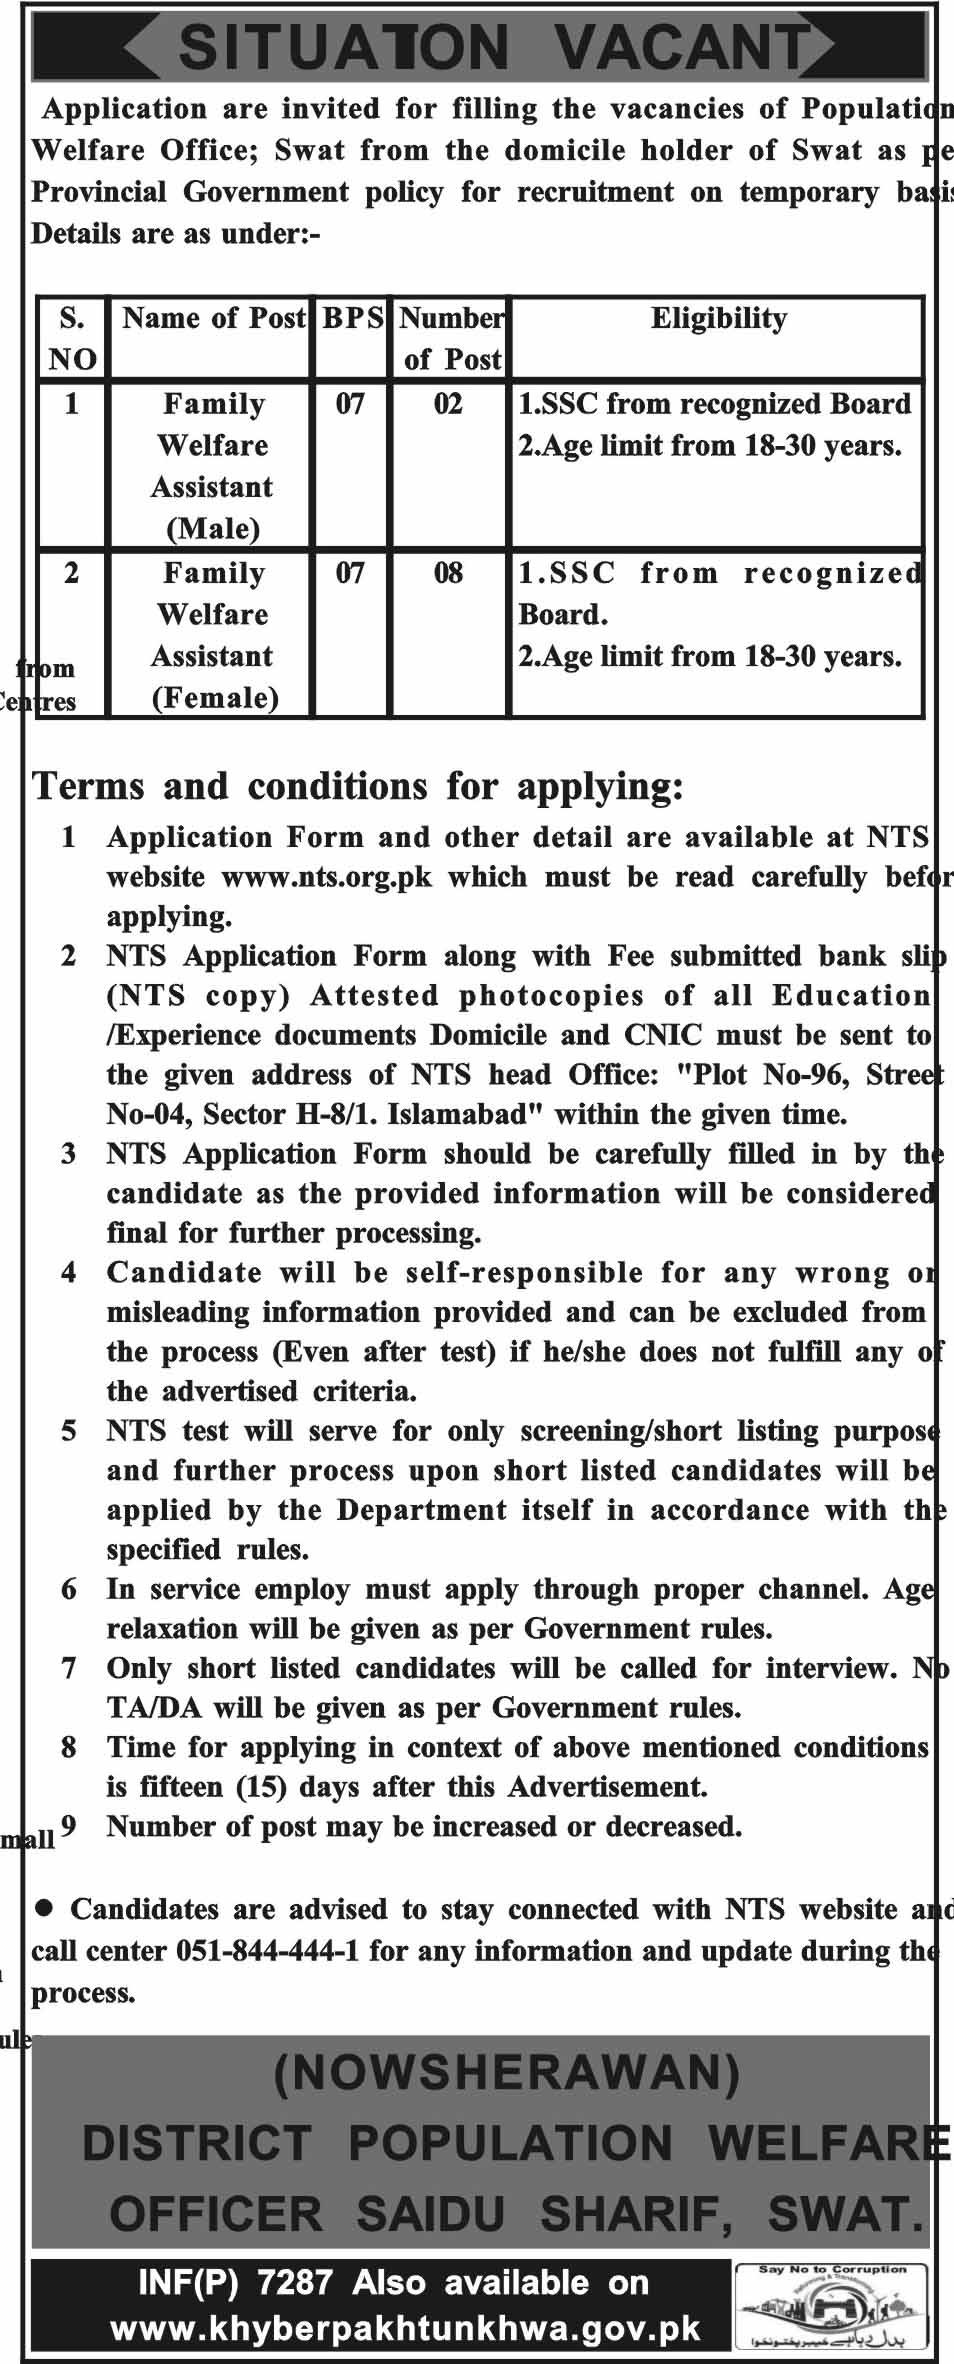 District Swat Population Welfare Department, 10 Jobs 26 December Daily Mashriq Newspaper.